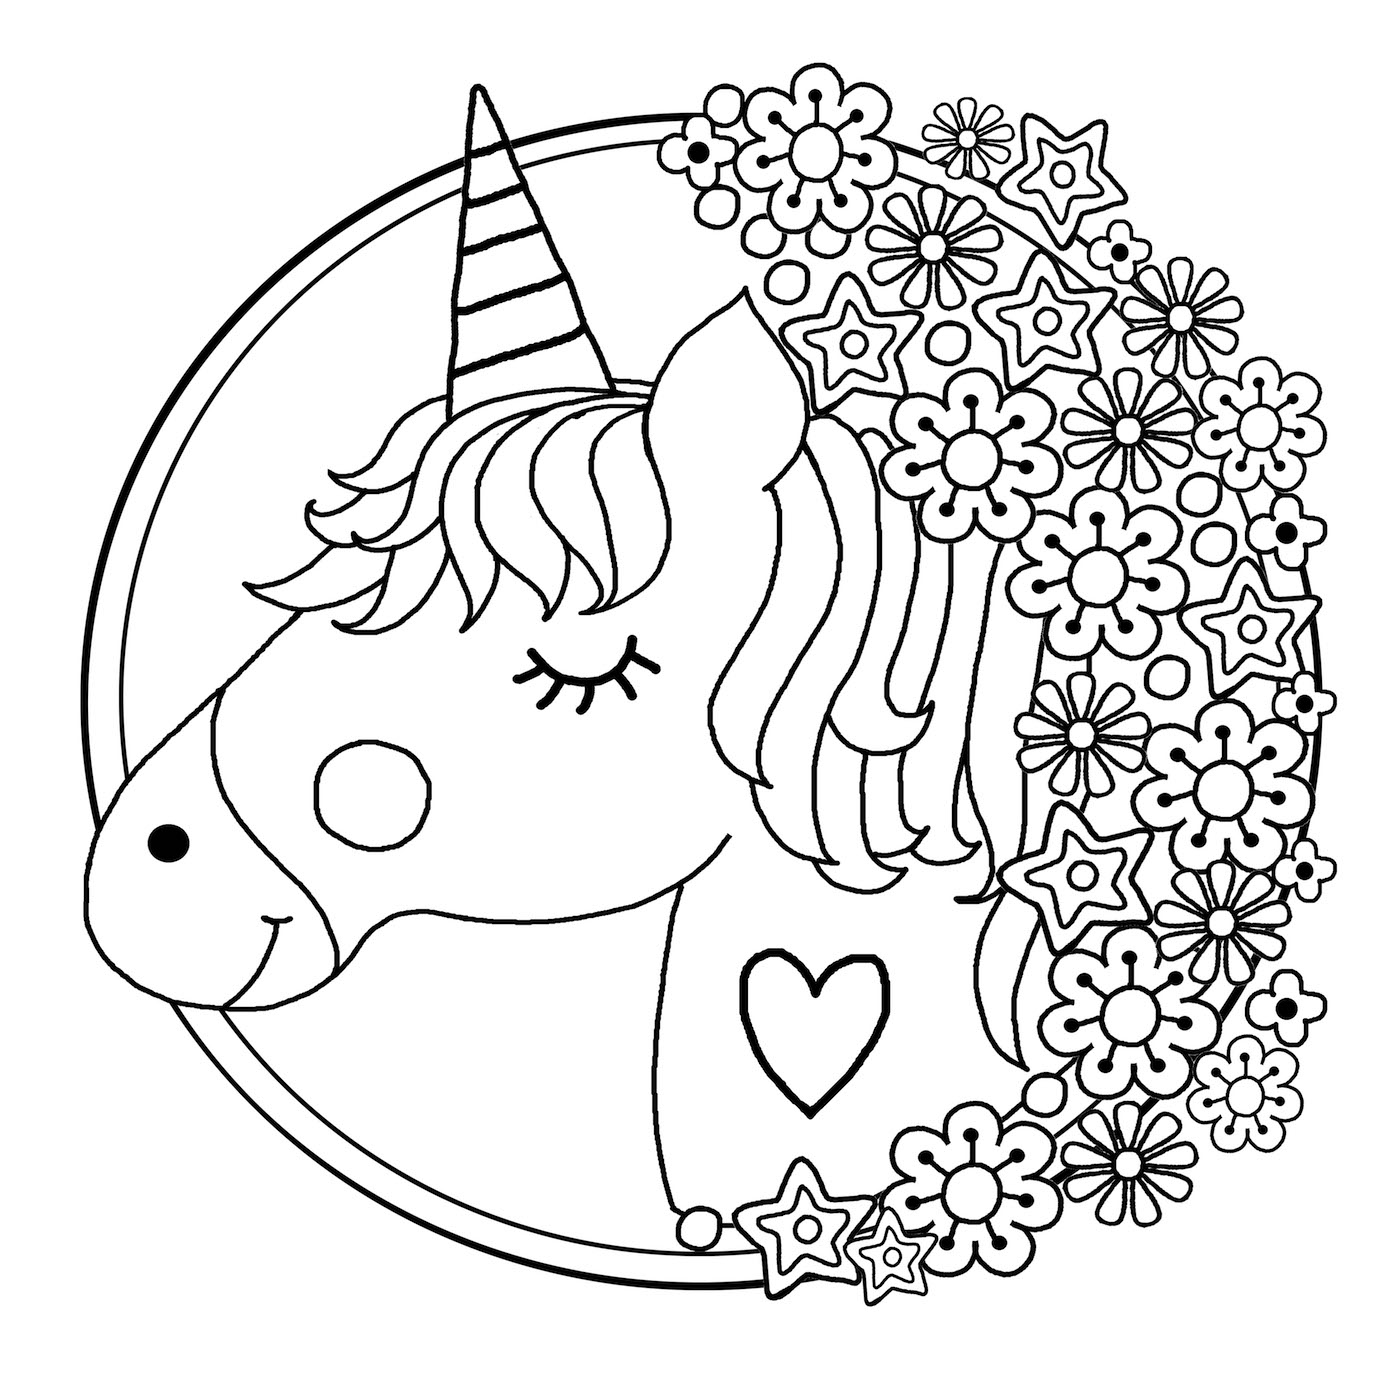 coloring page unicorn free printable unicorn coloring pages kids coloring page unicorn